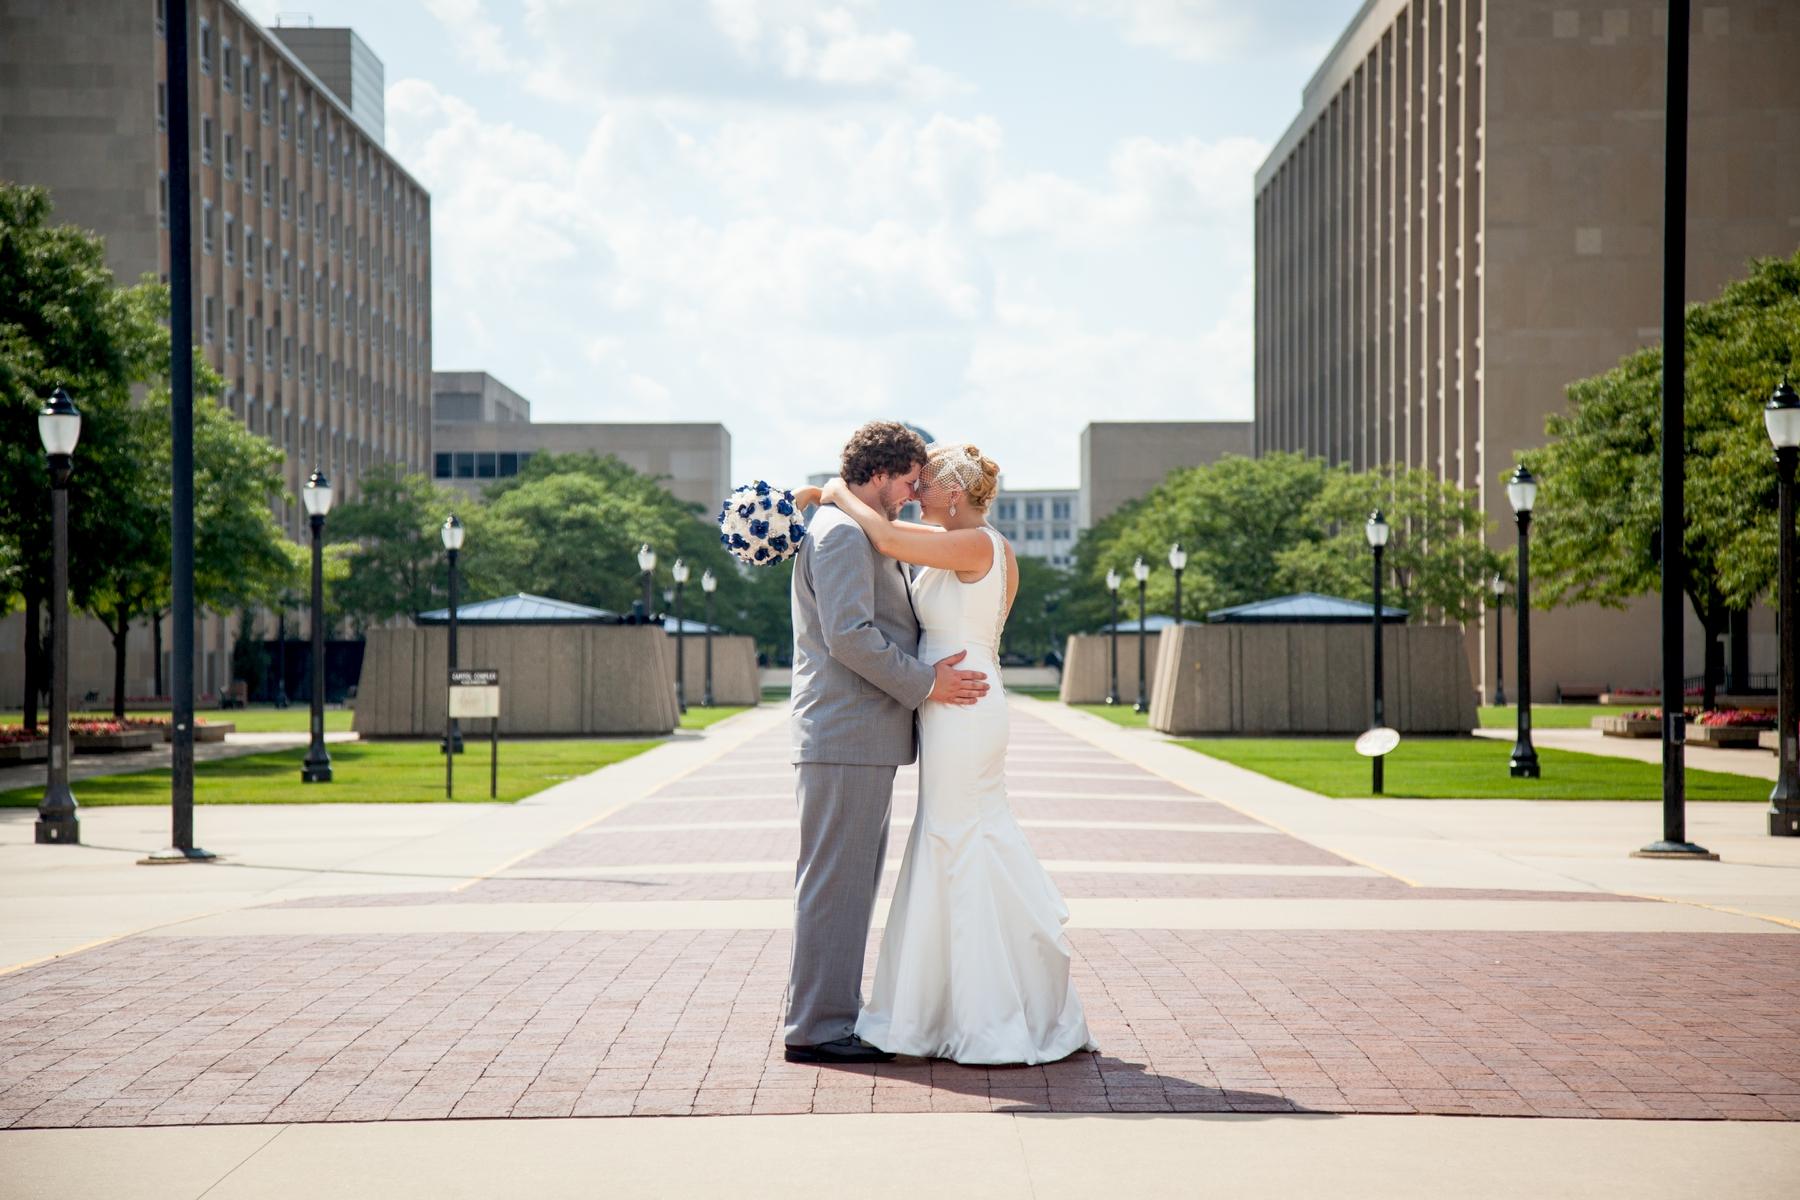 Brandon_Shafer_Photography_Chris_Lauren_Michigan_State_Capital_Wedding_0031.jpg